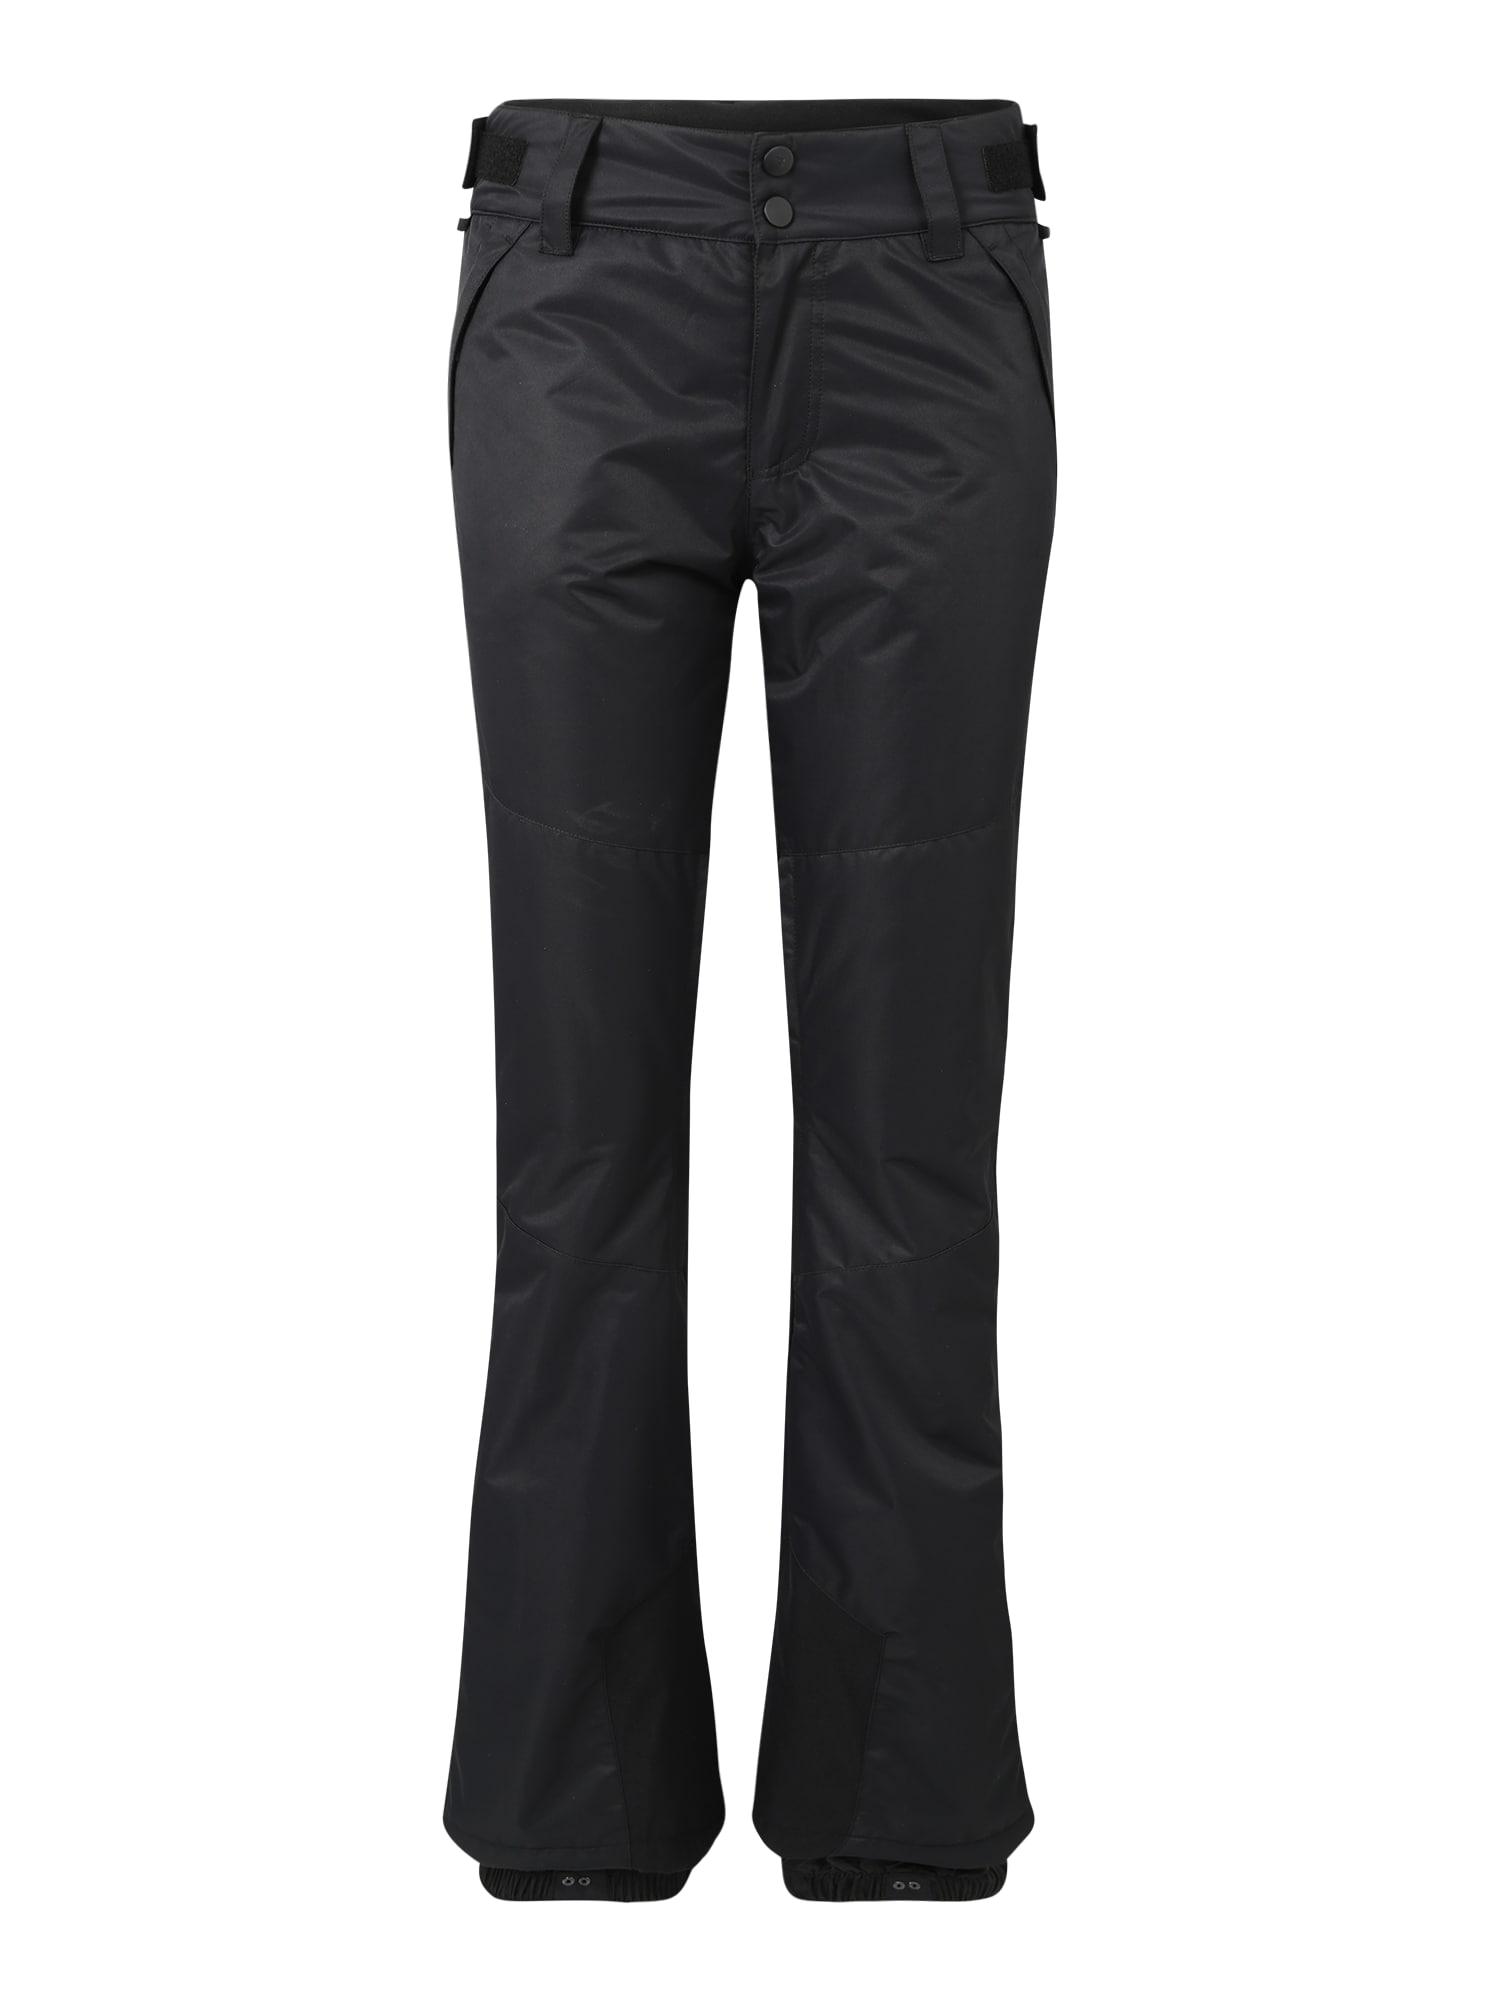 BILLABONG Sportinės kelnės 'Malla' juoda